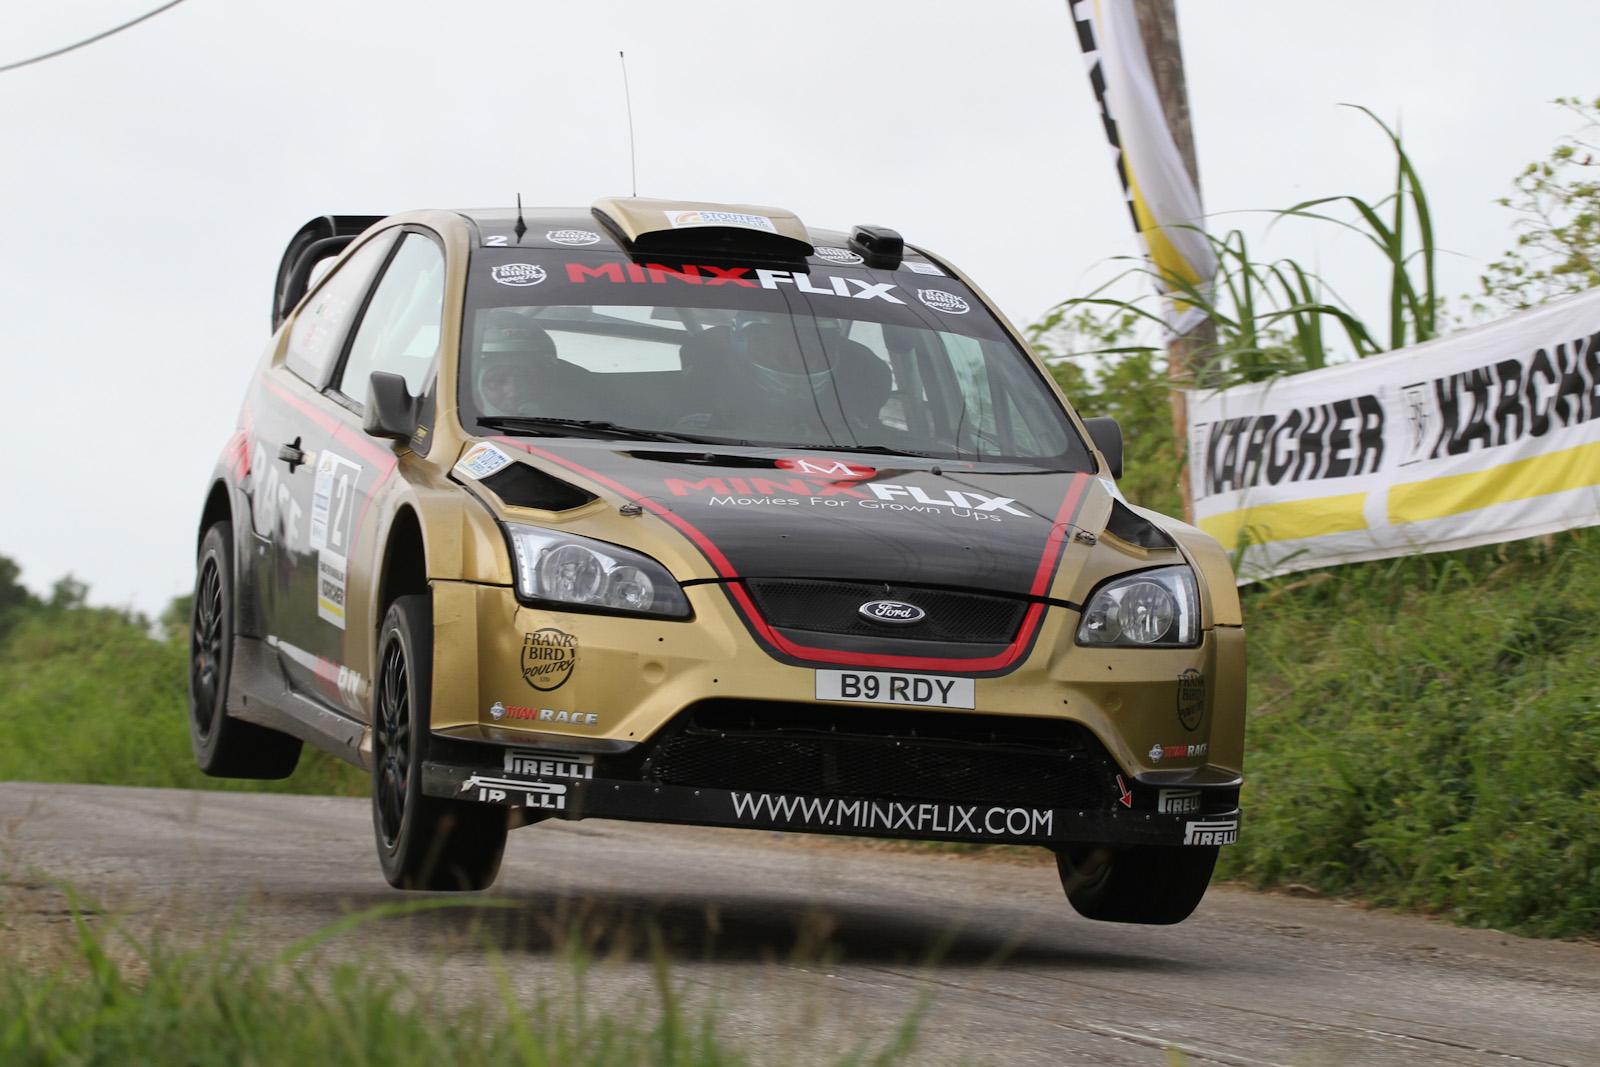 Eamonn Boland - Dom Buckley Motorsports